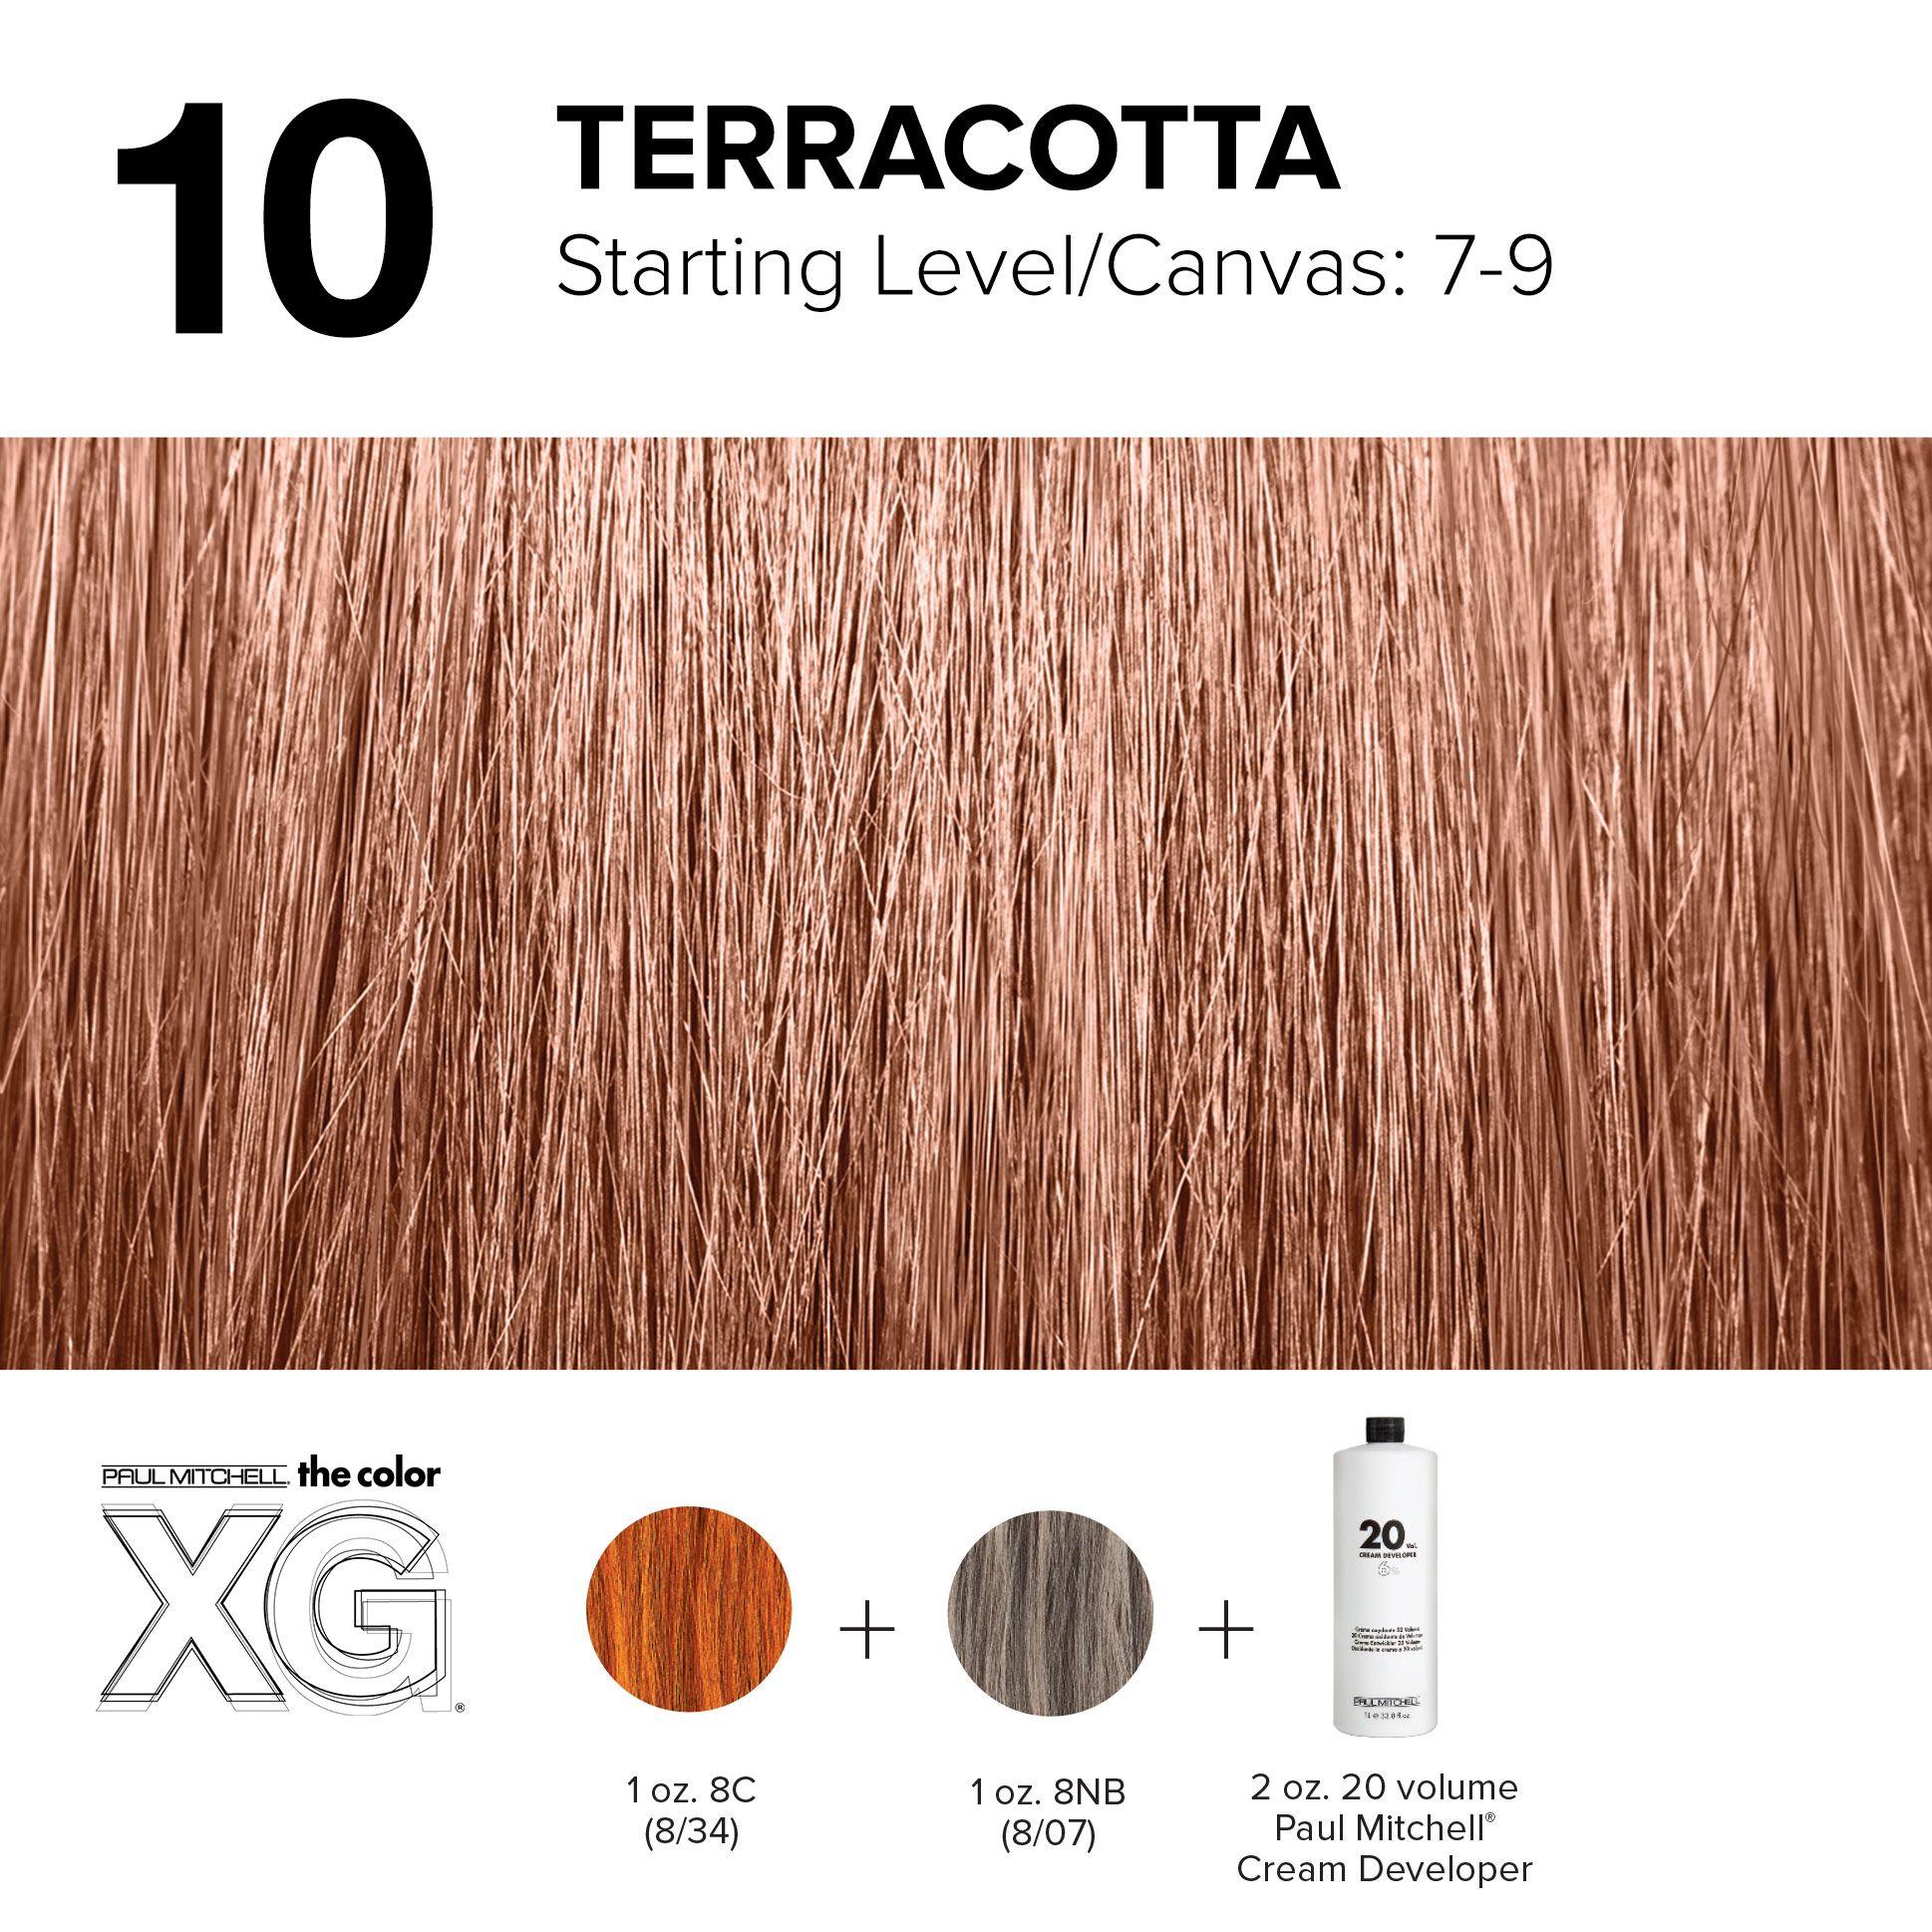 10 Terracotta Paul Mitchell Color Hair Color Formulas Red Violet Hair Color